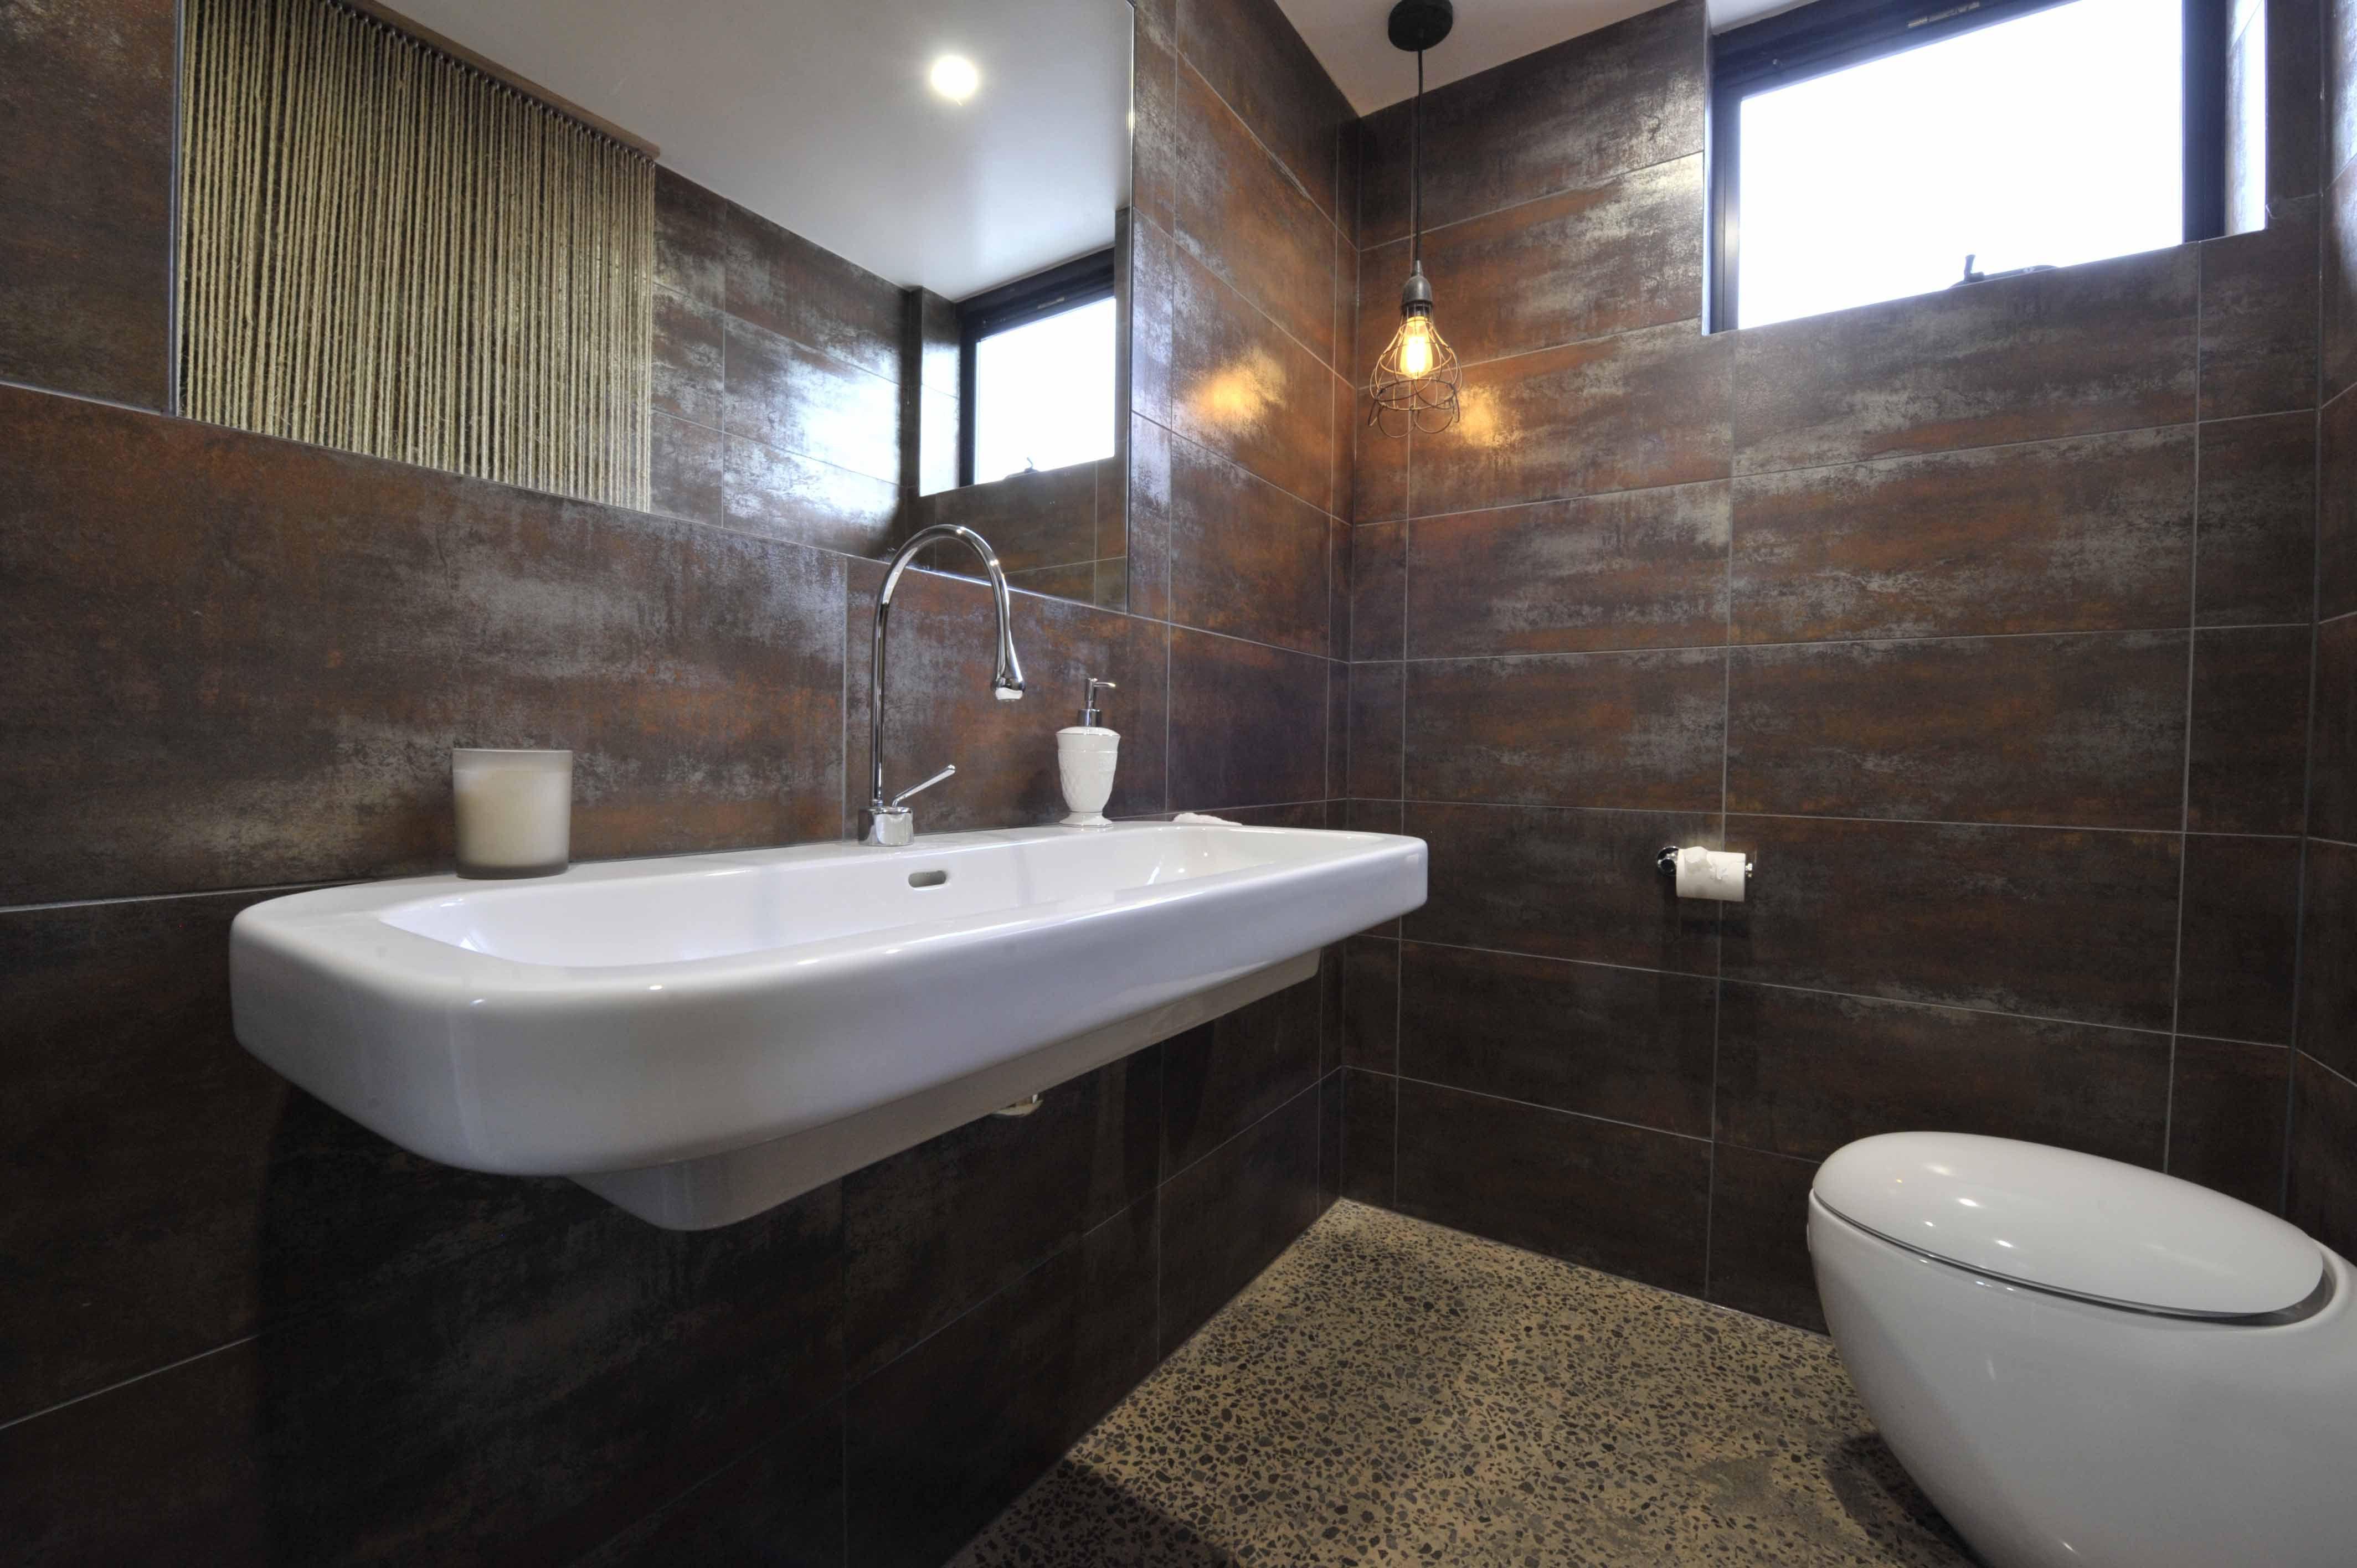 Alisa lysandra ground floor powder room metallic rust 300x600 ground floor powder room metallic rust 300x600 tile dailygadgetfo Choice Image